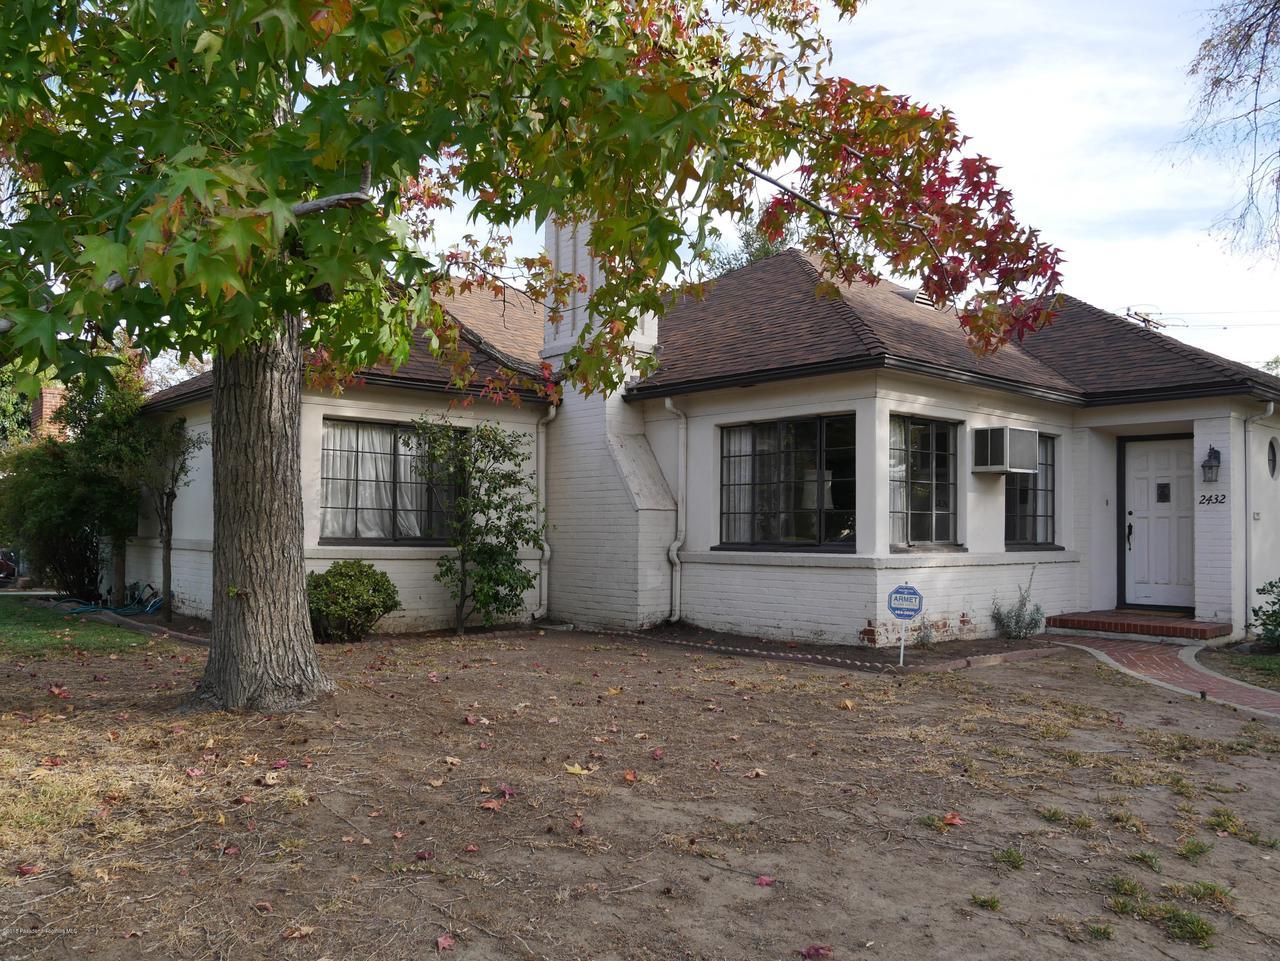 2432 ORANGE GROVE, Pasadena, CA 91104 - Front yard 2